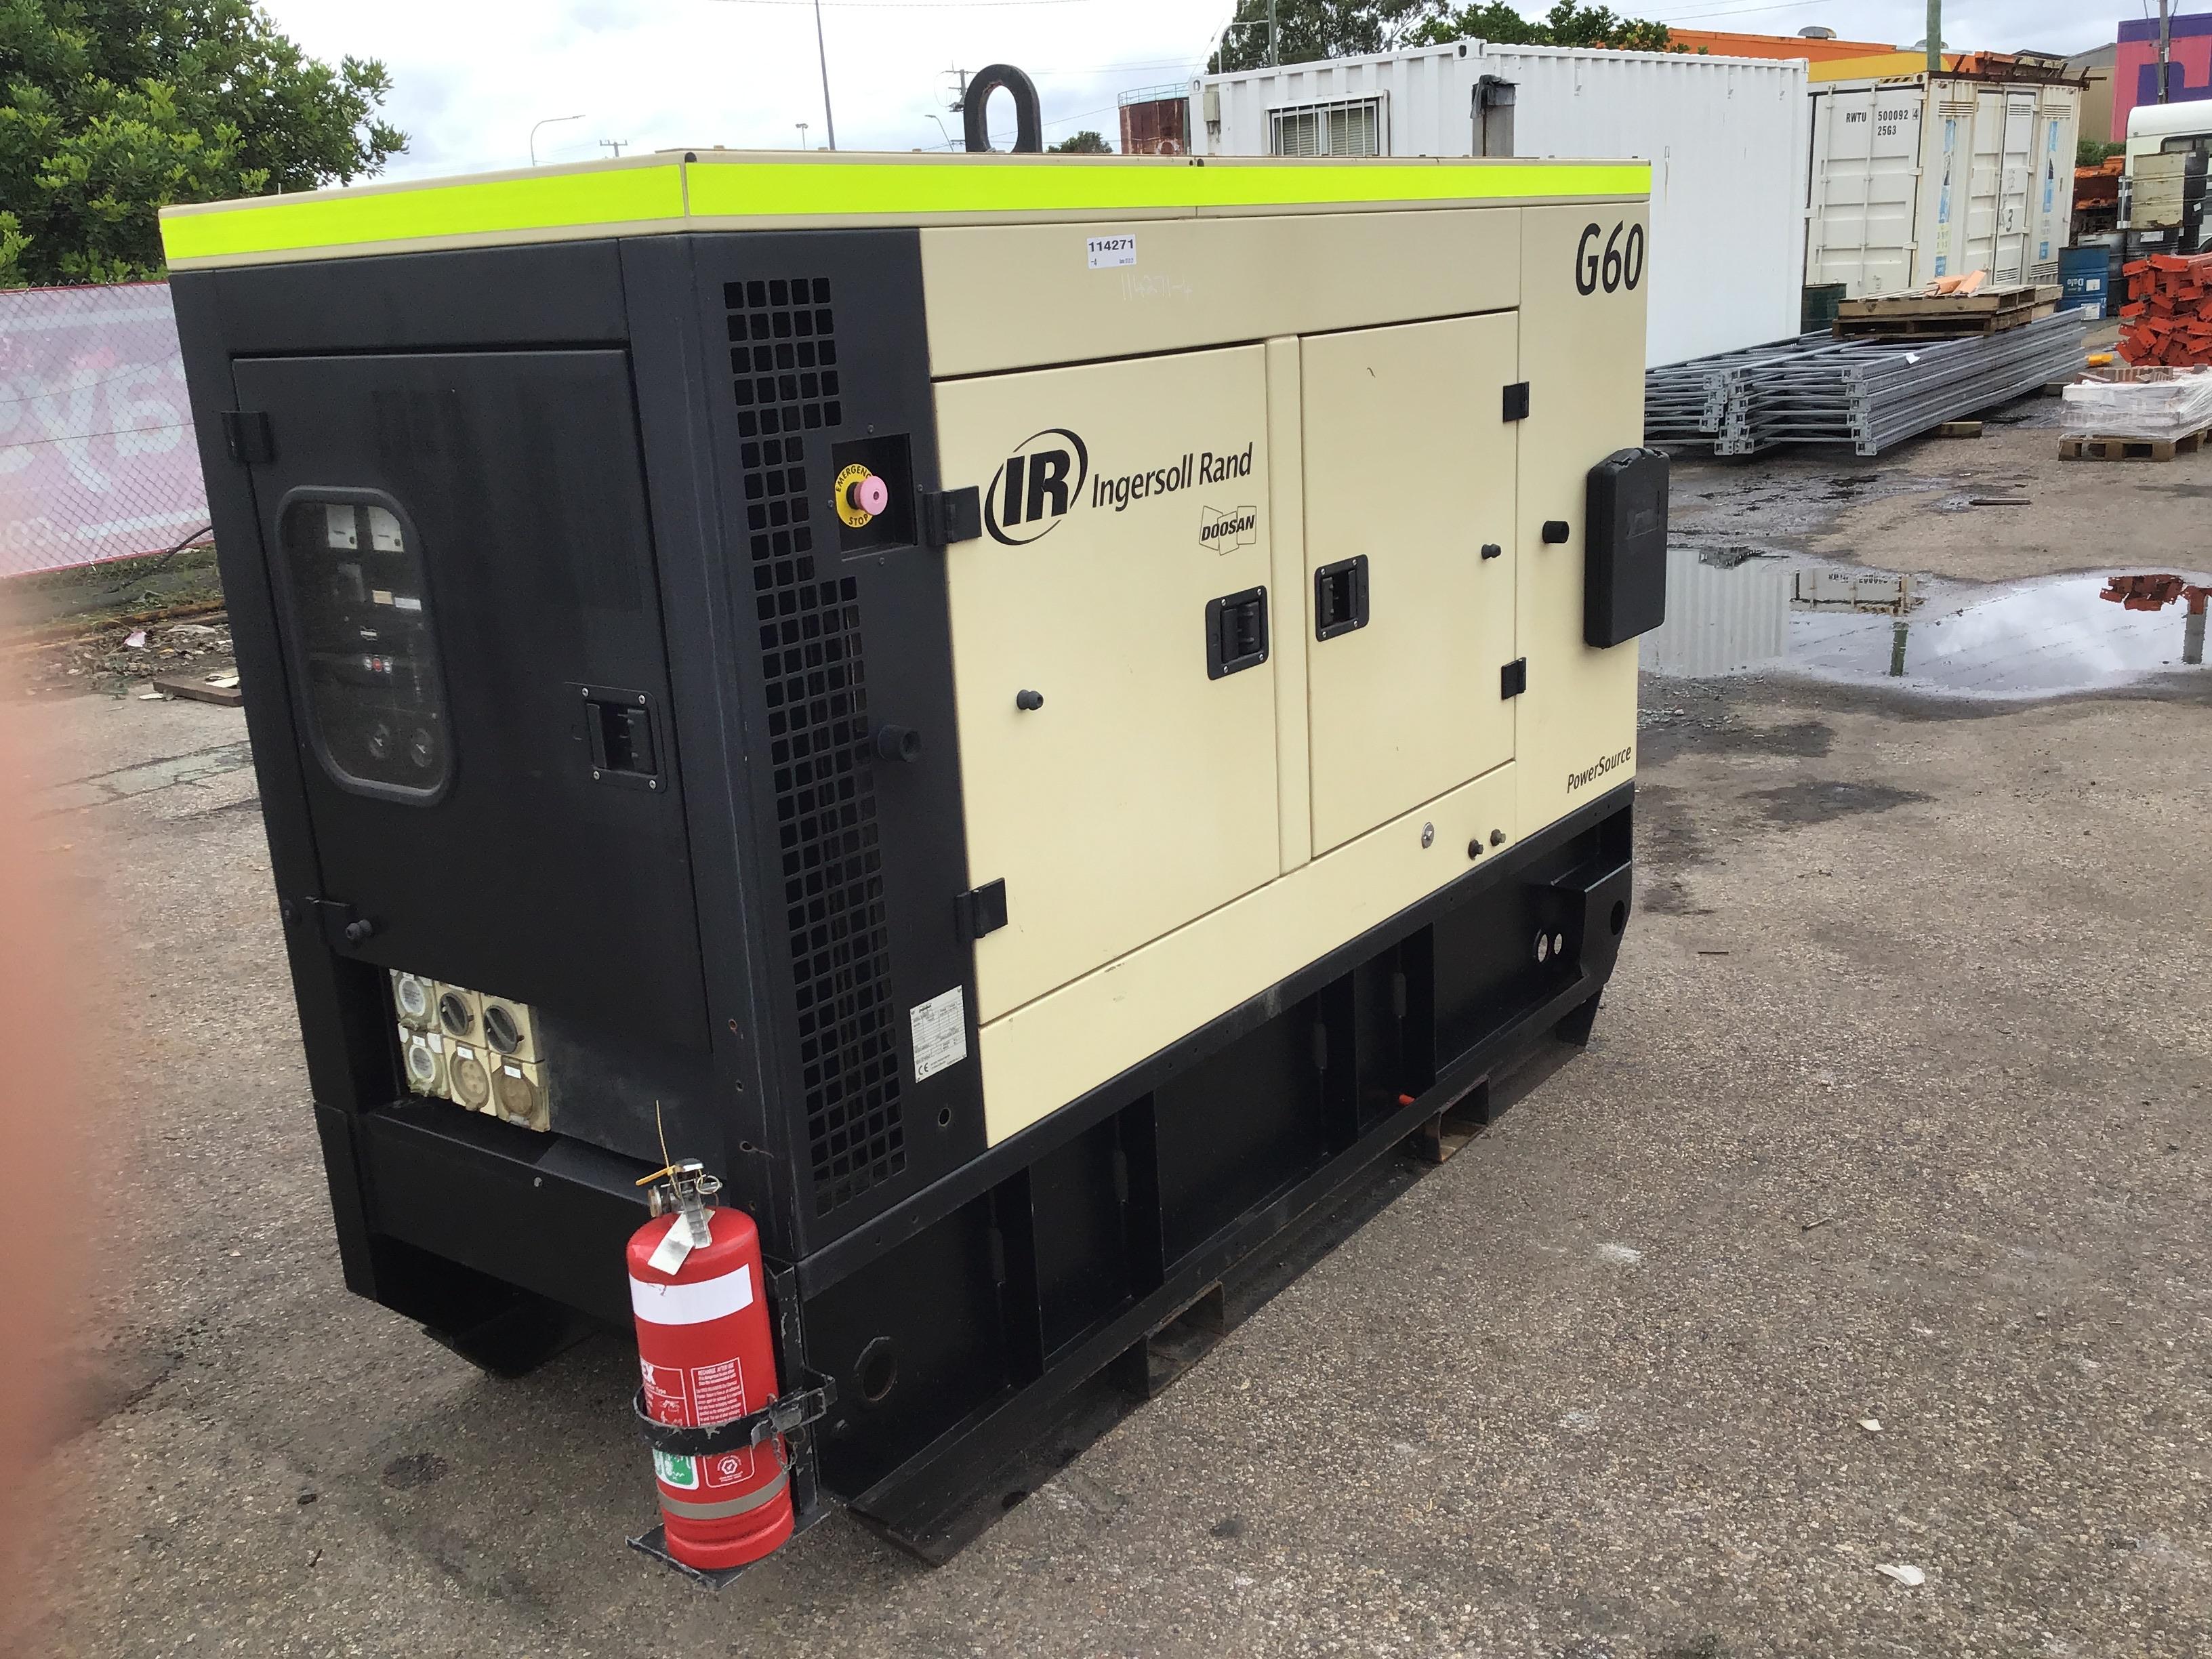 2011 Doosan Ingersoll Rand G60 60kVA Generator